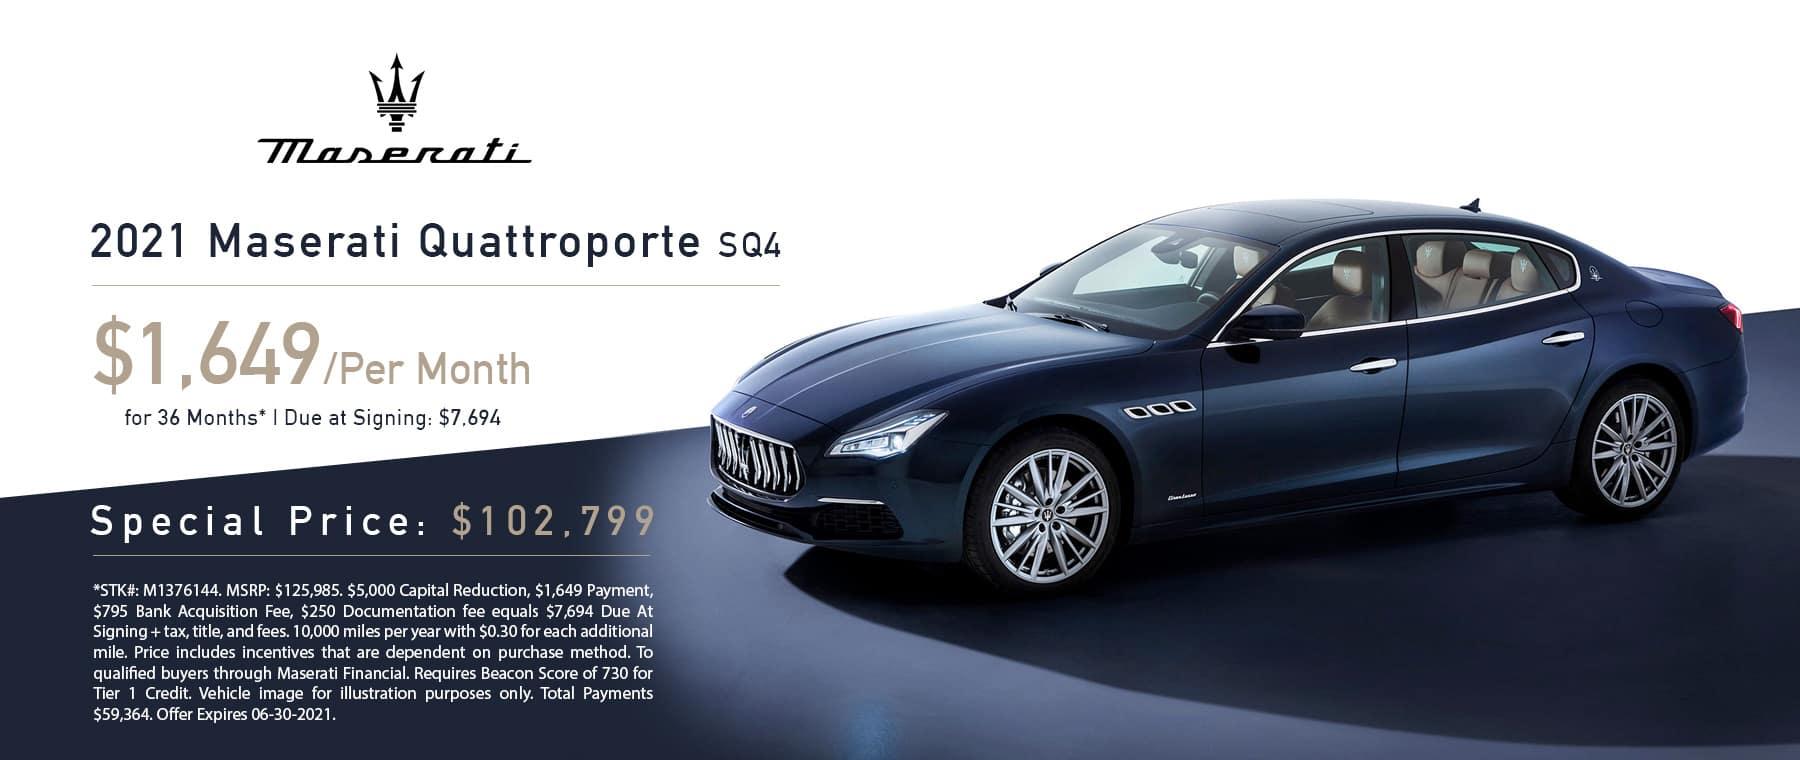 Maserati_2021_Quattroporte_Slide_June2021_1